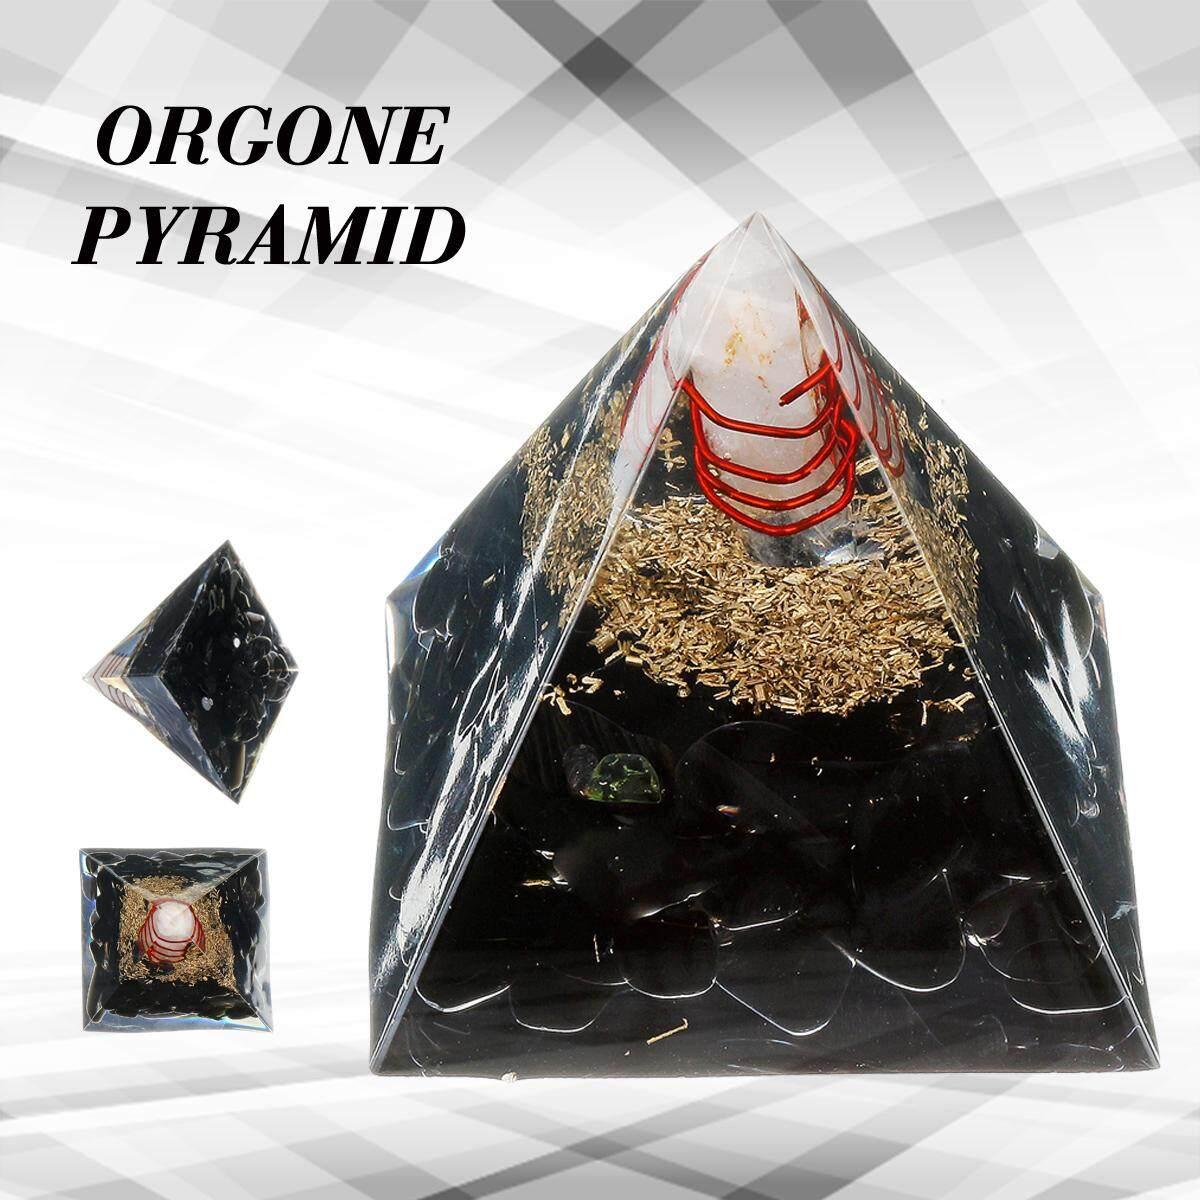 Himalayas Stone Orgone Pyramid Energy Generator Tower Home Reiki Healing  Crystal